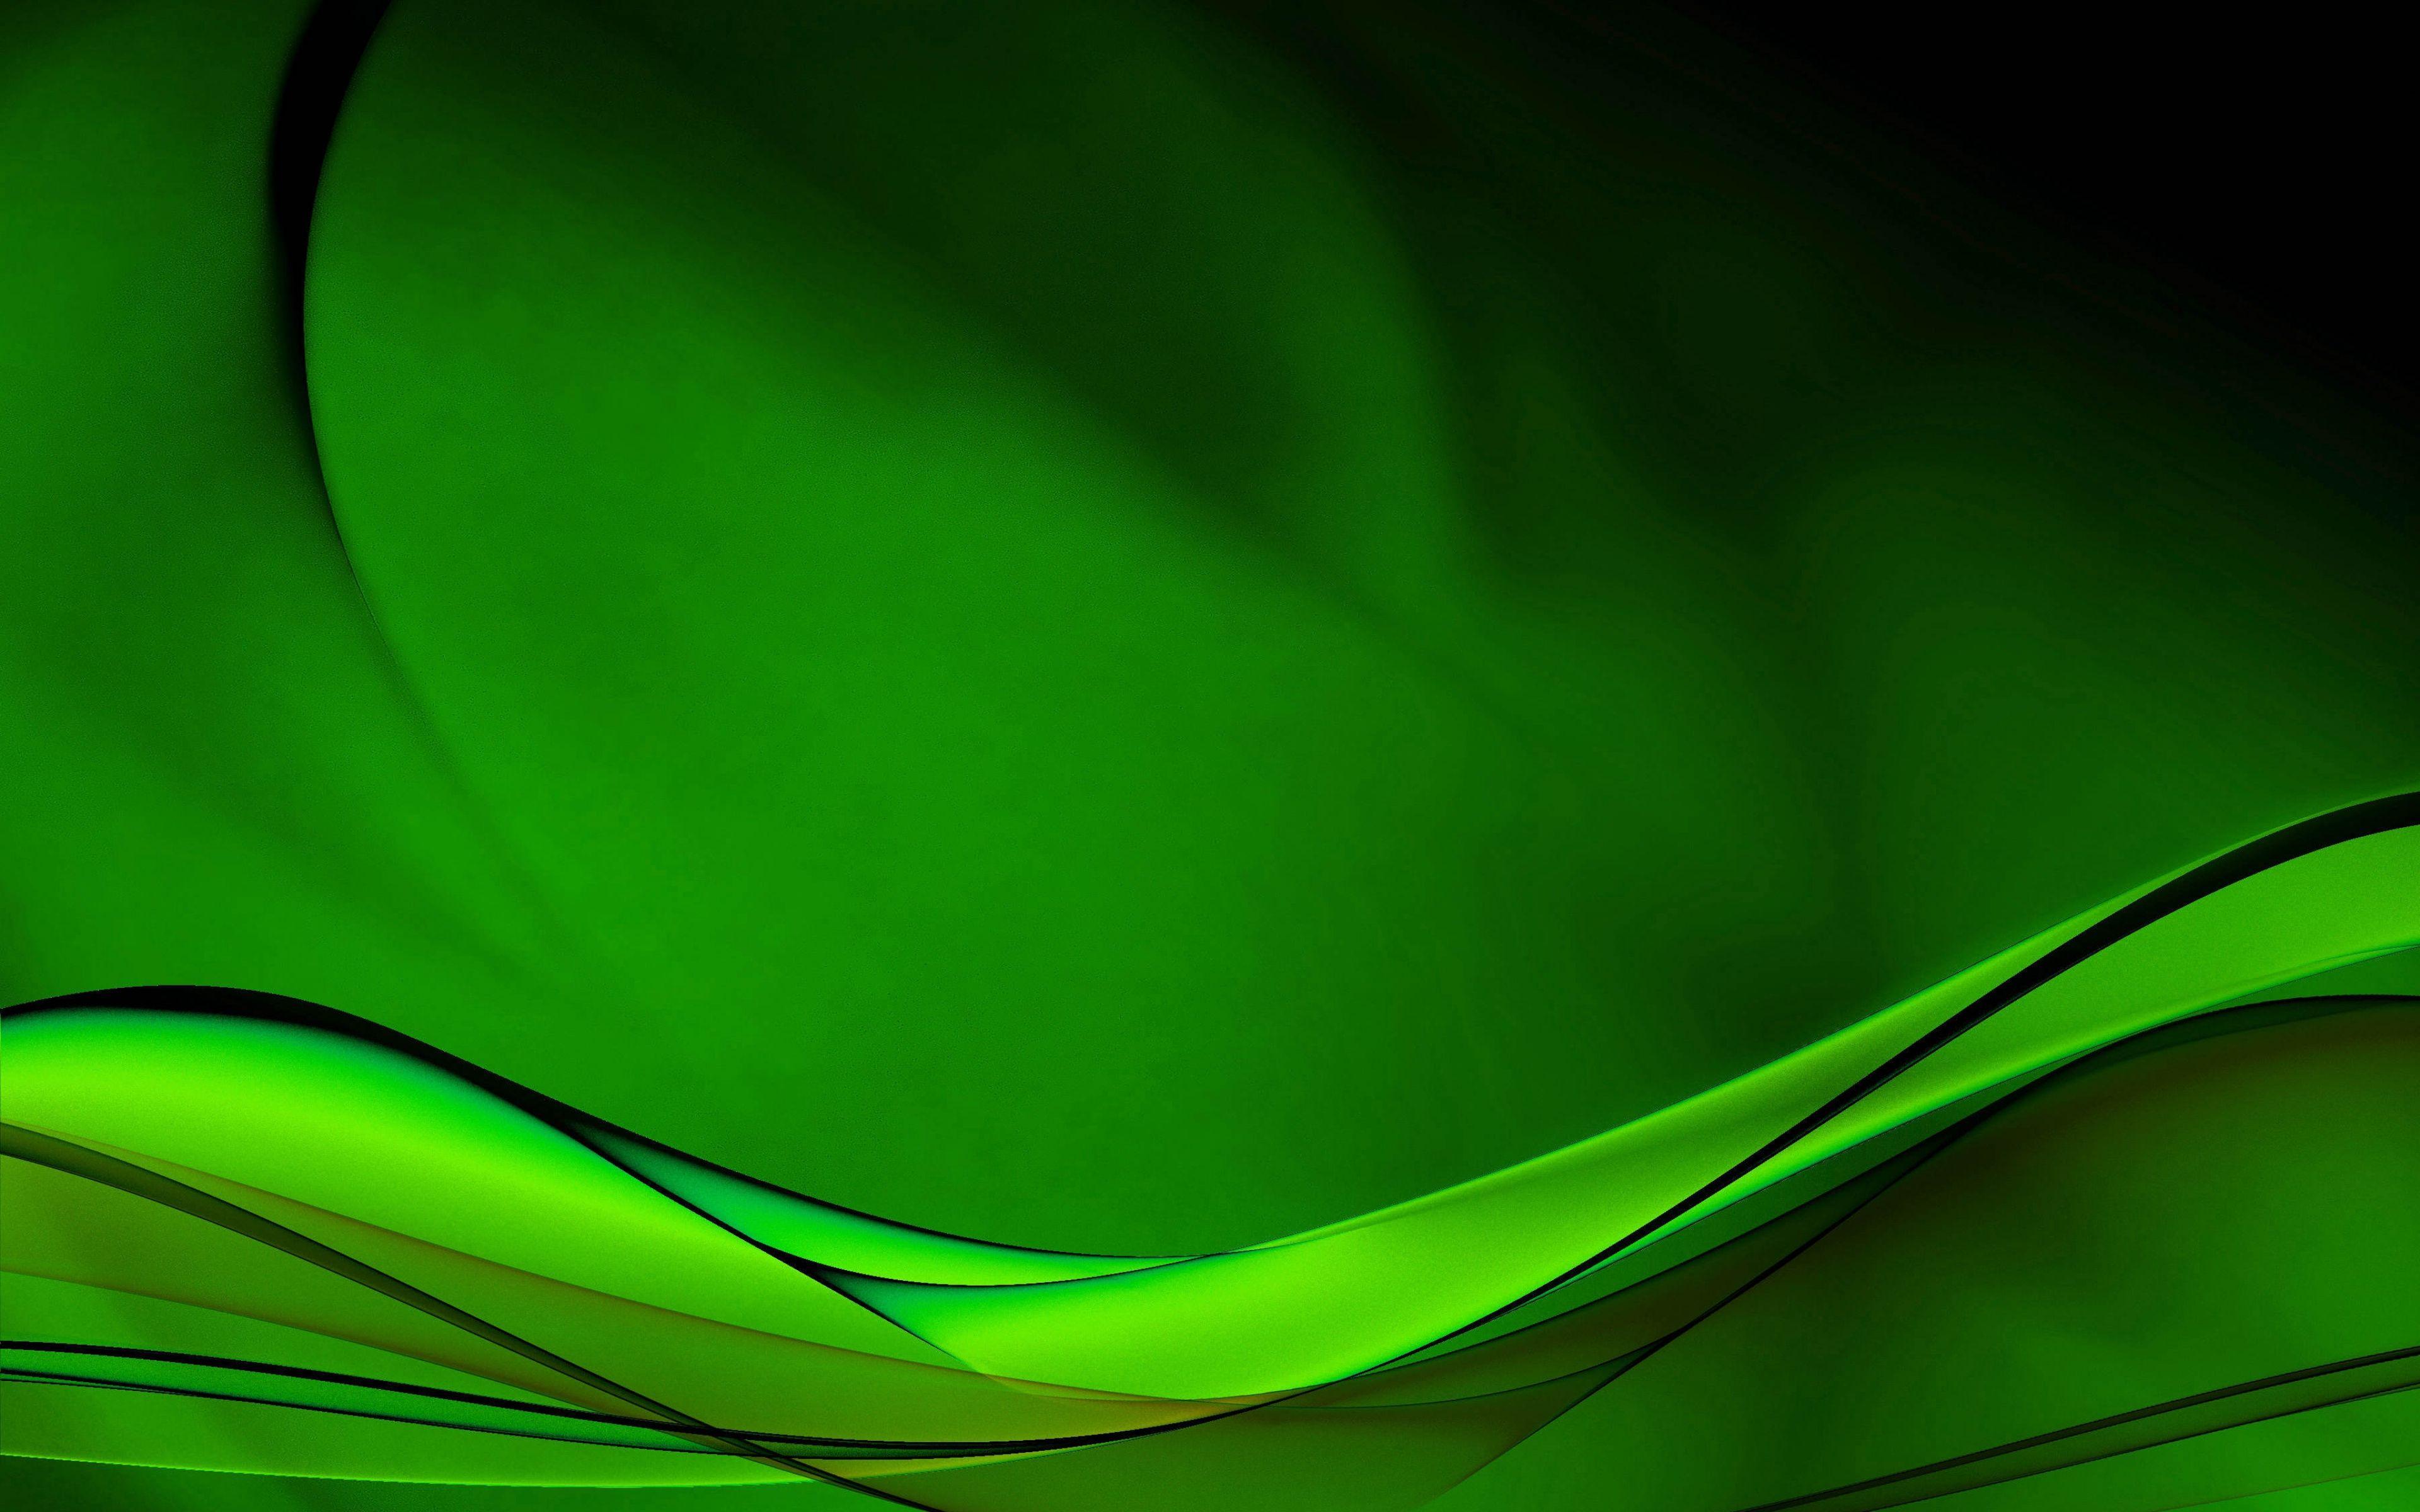 Green Wallpapers Widescreen Backgrounds